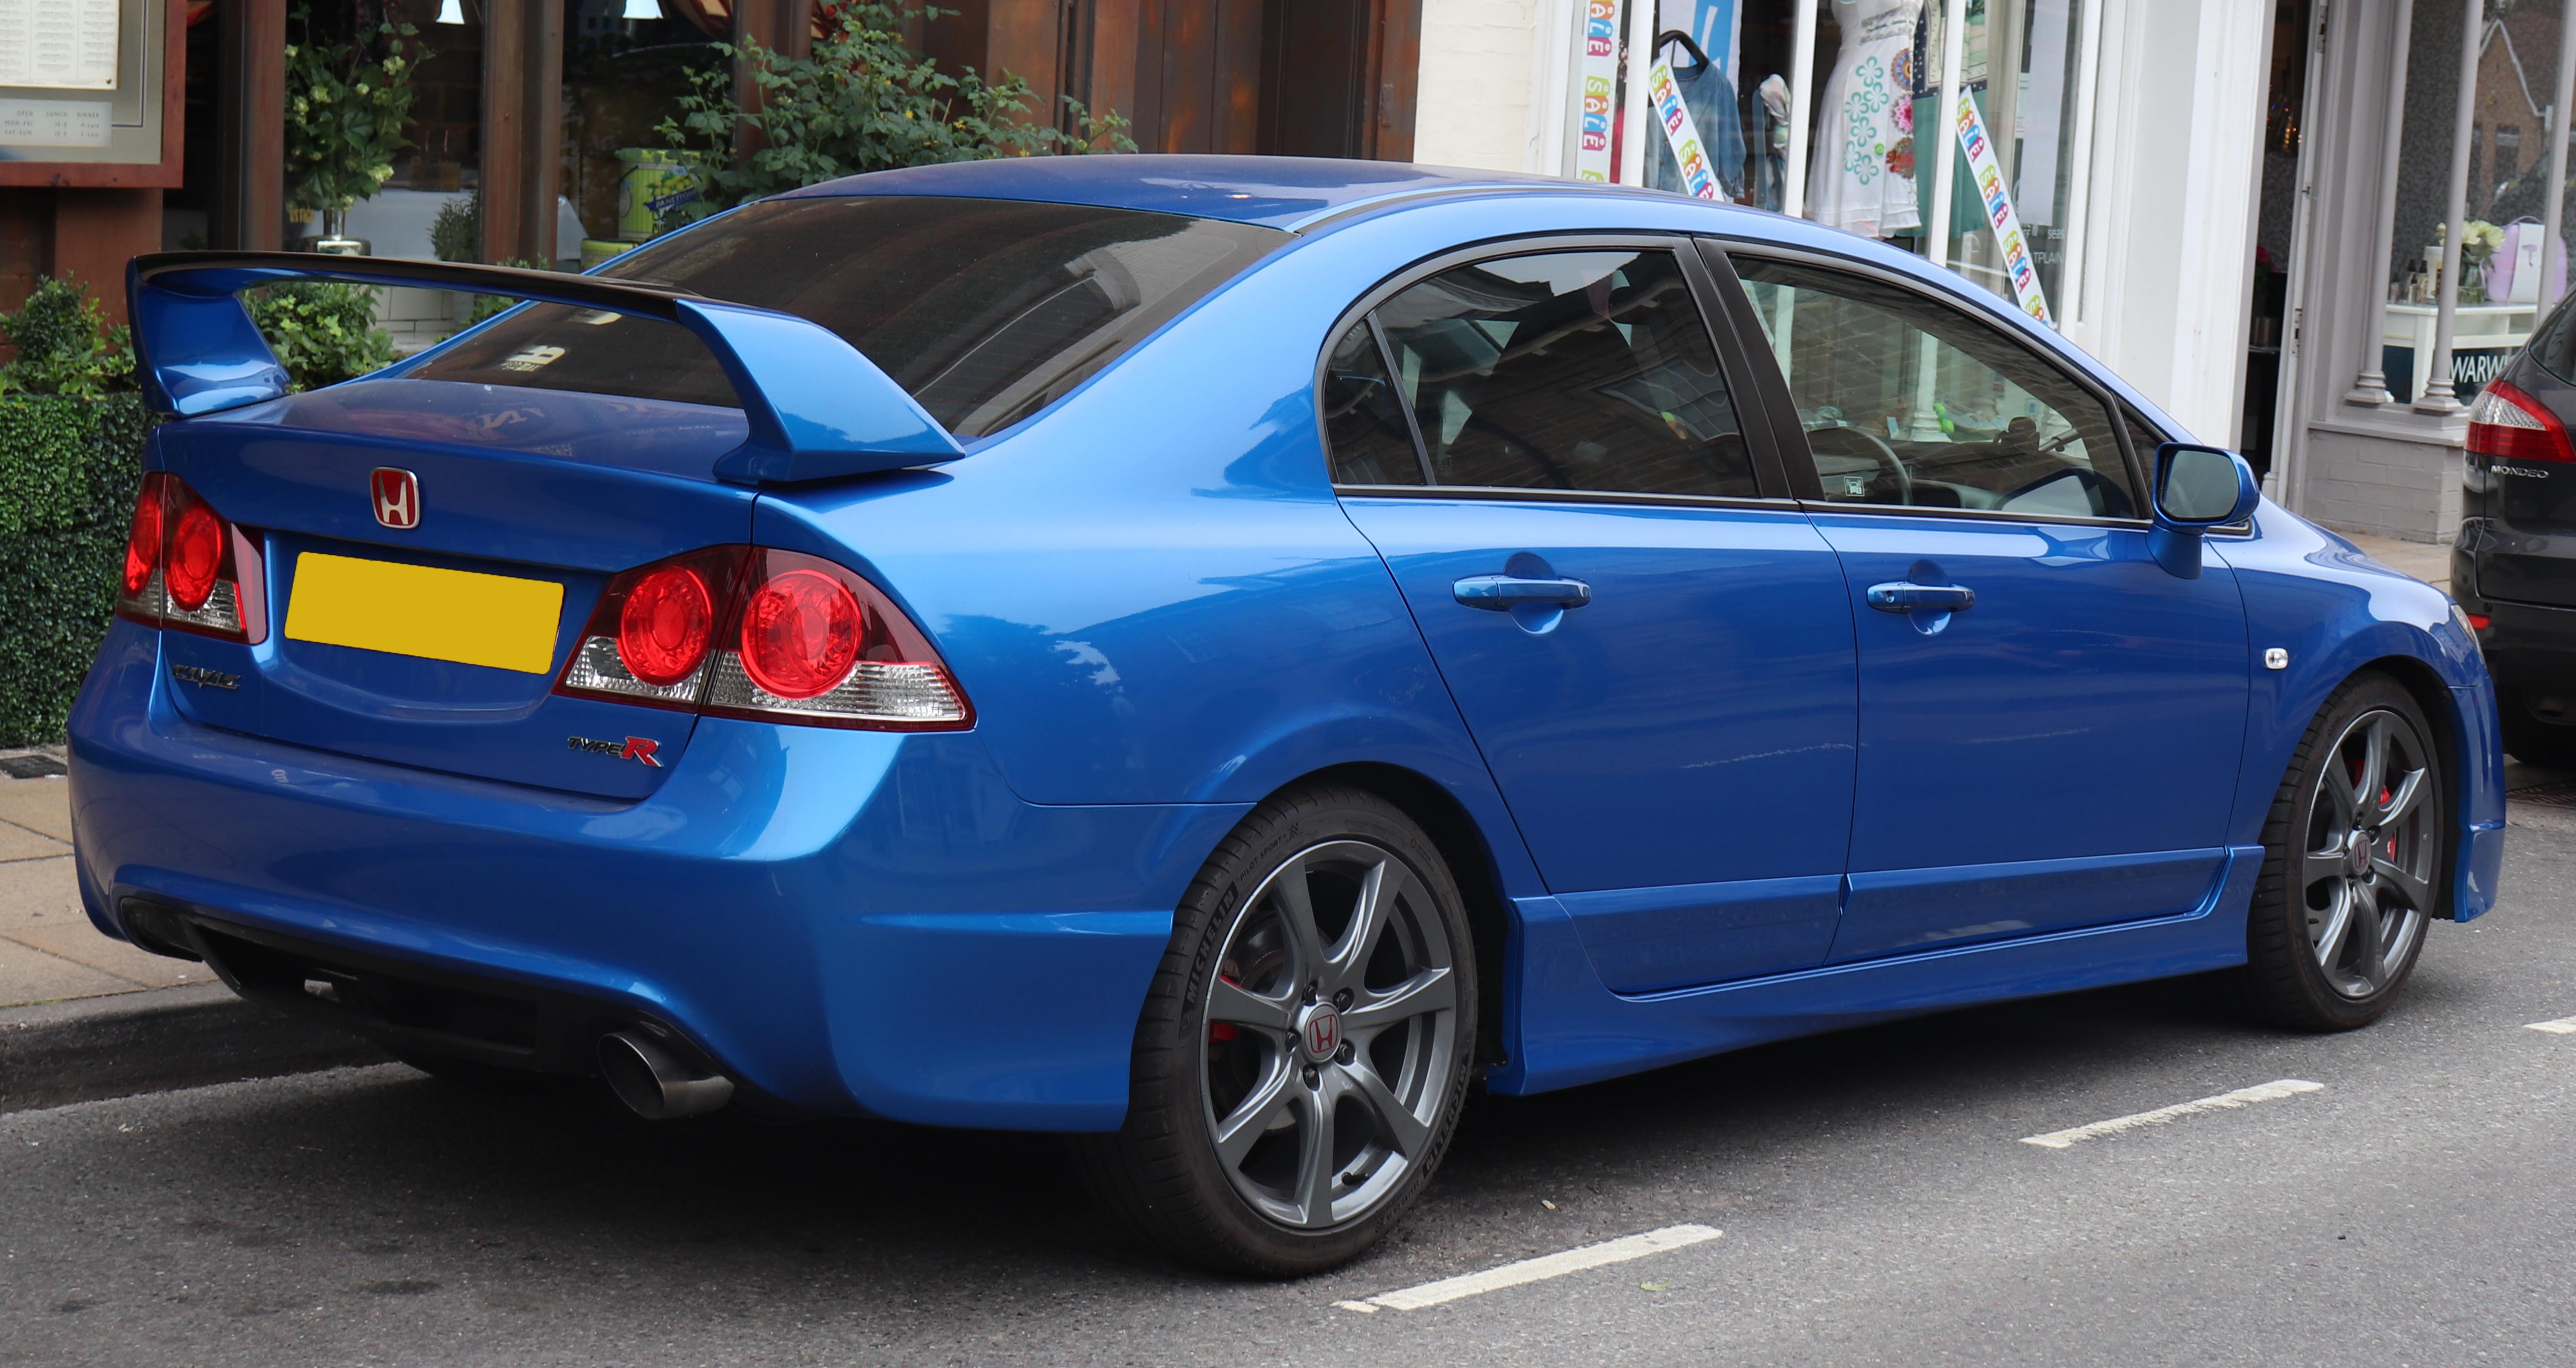 File:2008 Honda Civic Type-R 2.0 Rear.jpg - Wikimedia Commons